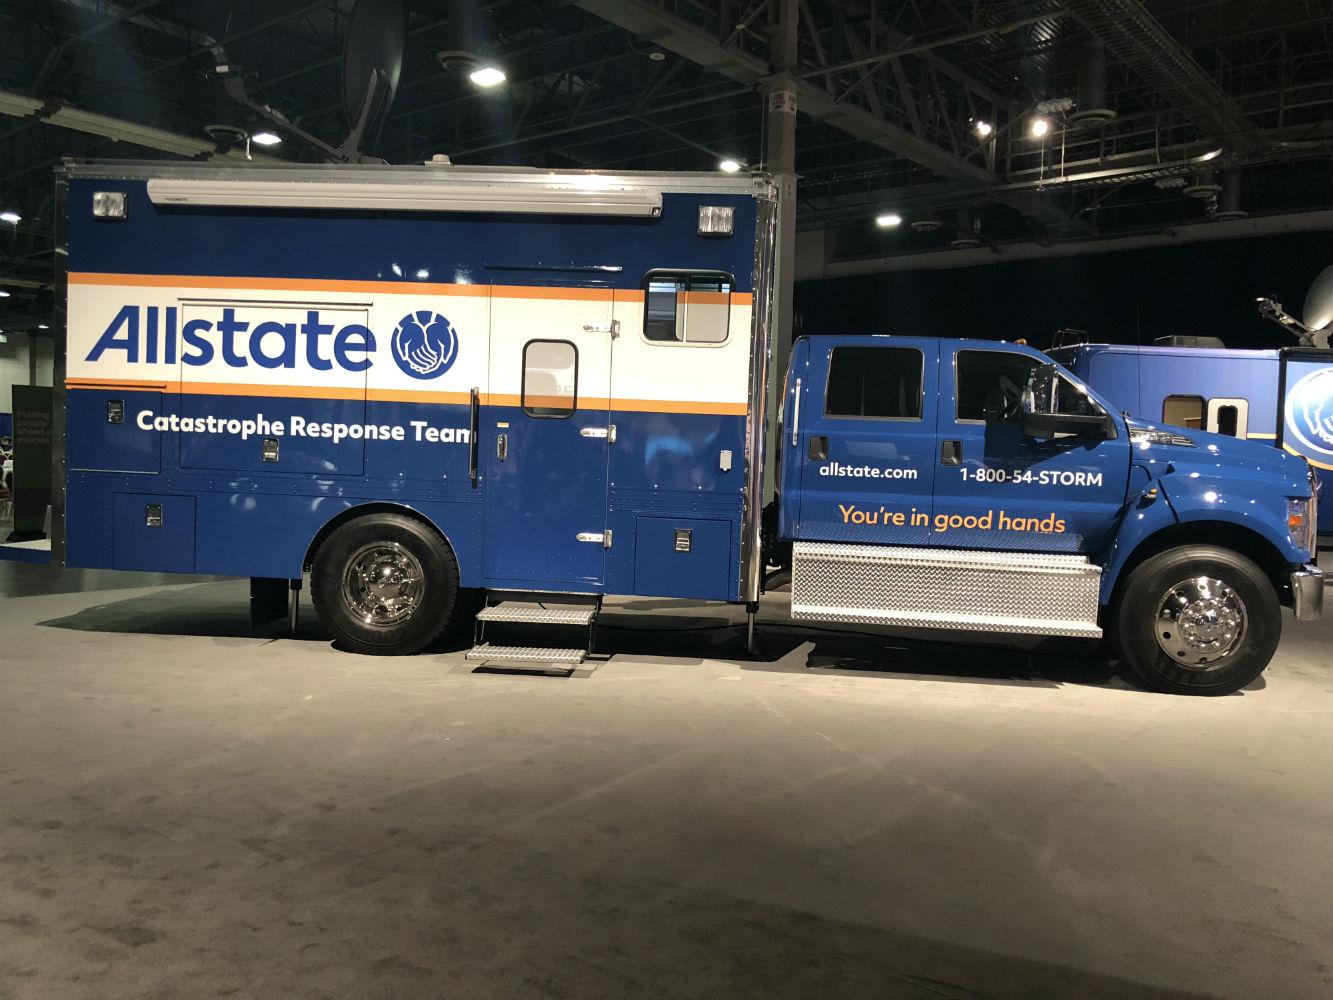 David Lieberman: Allstate Insurance image 11